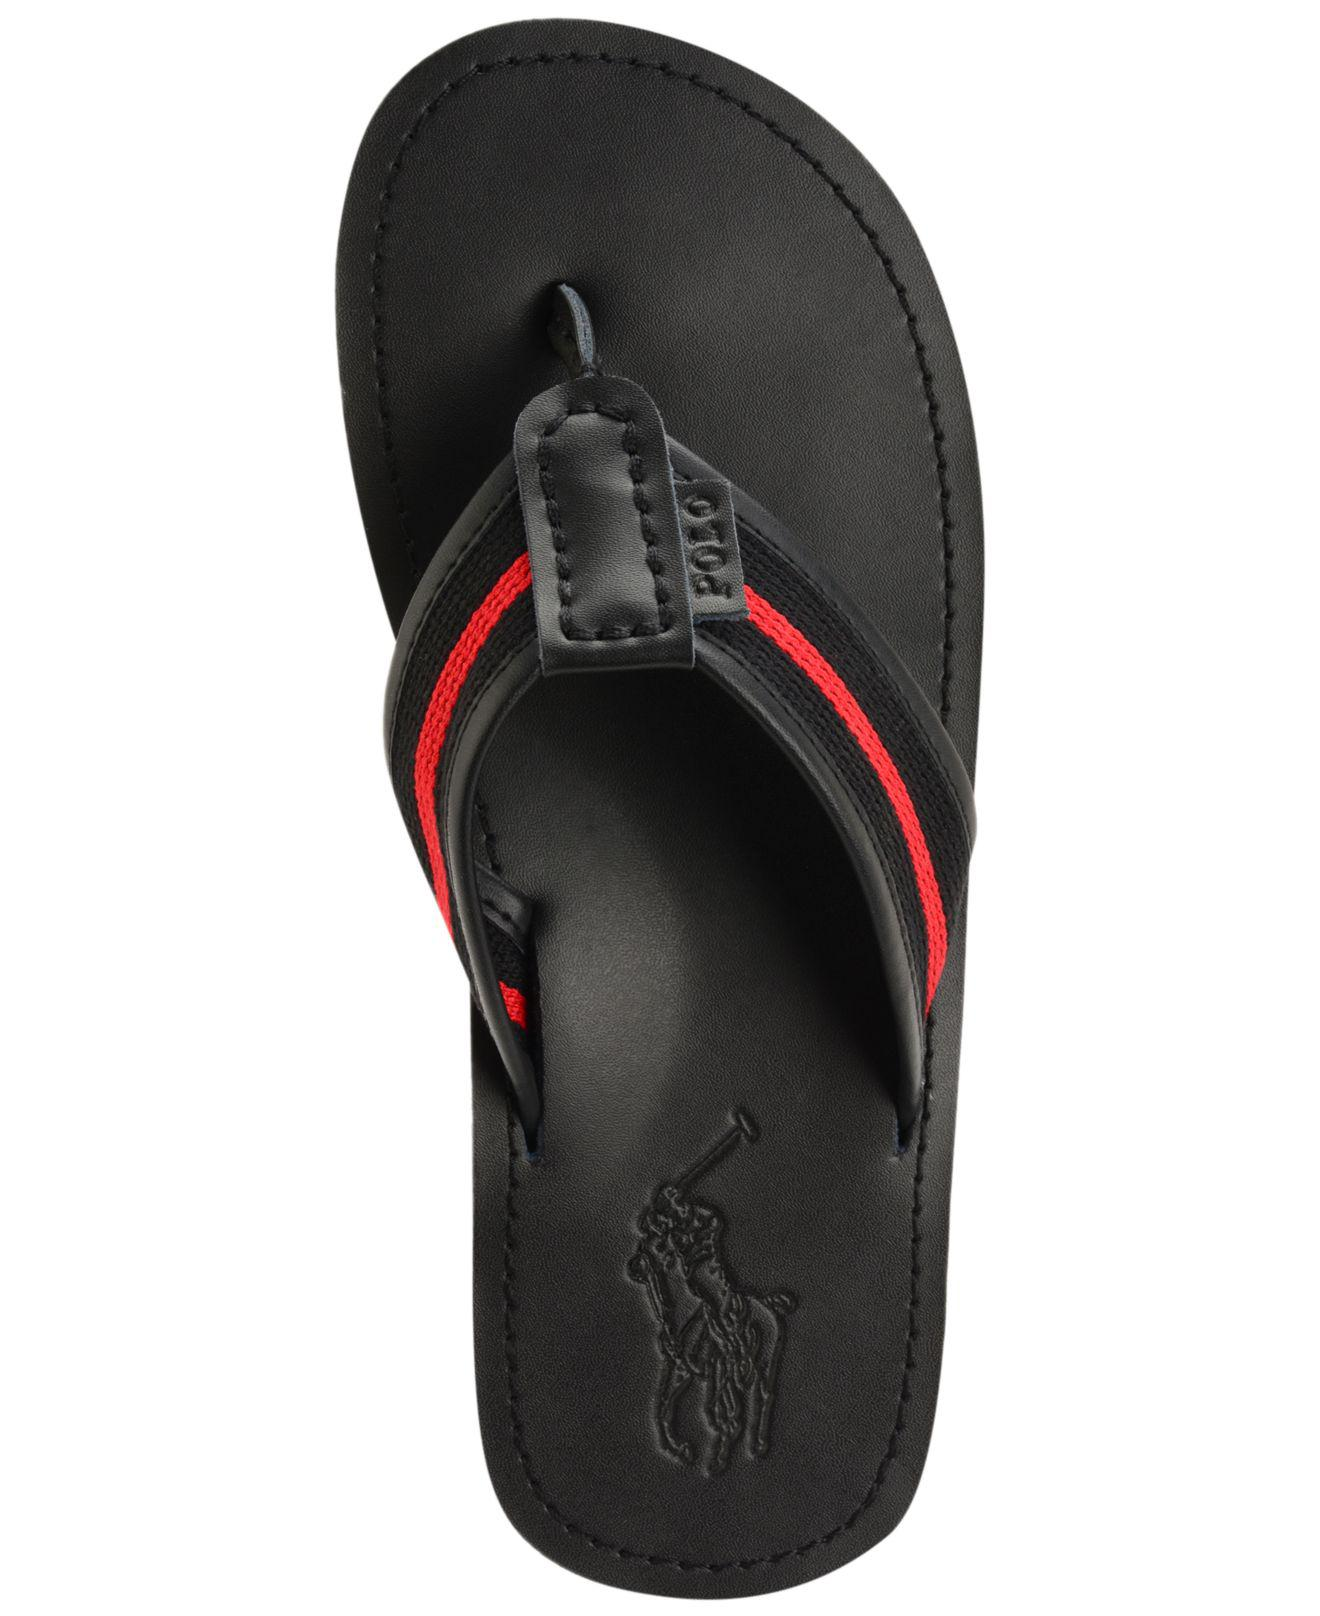 e43c5d986ed Lyst - Polo Ralph Lauren Men s Sullivan Ii Sandals in Black for Men